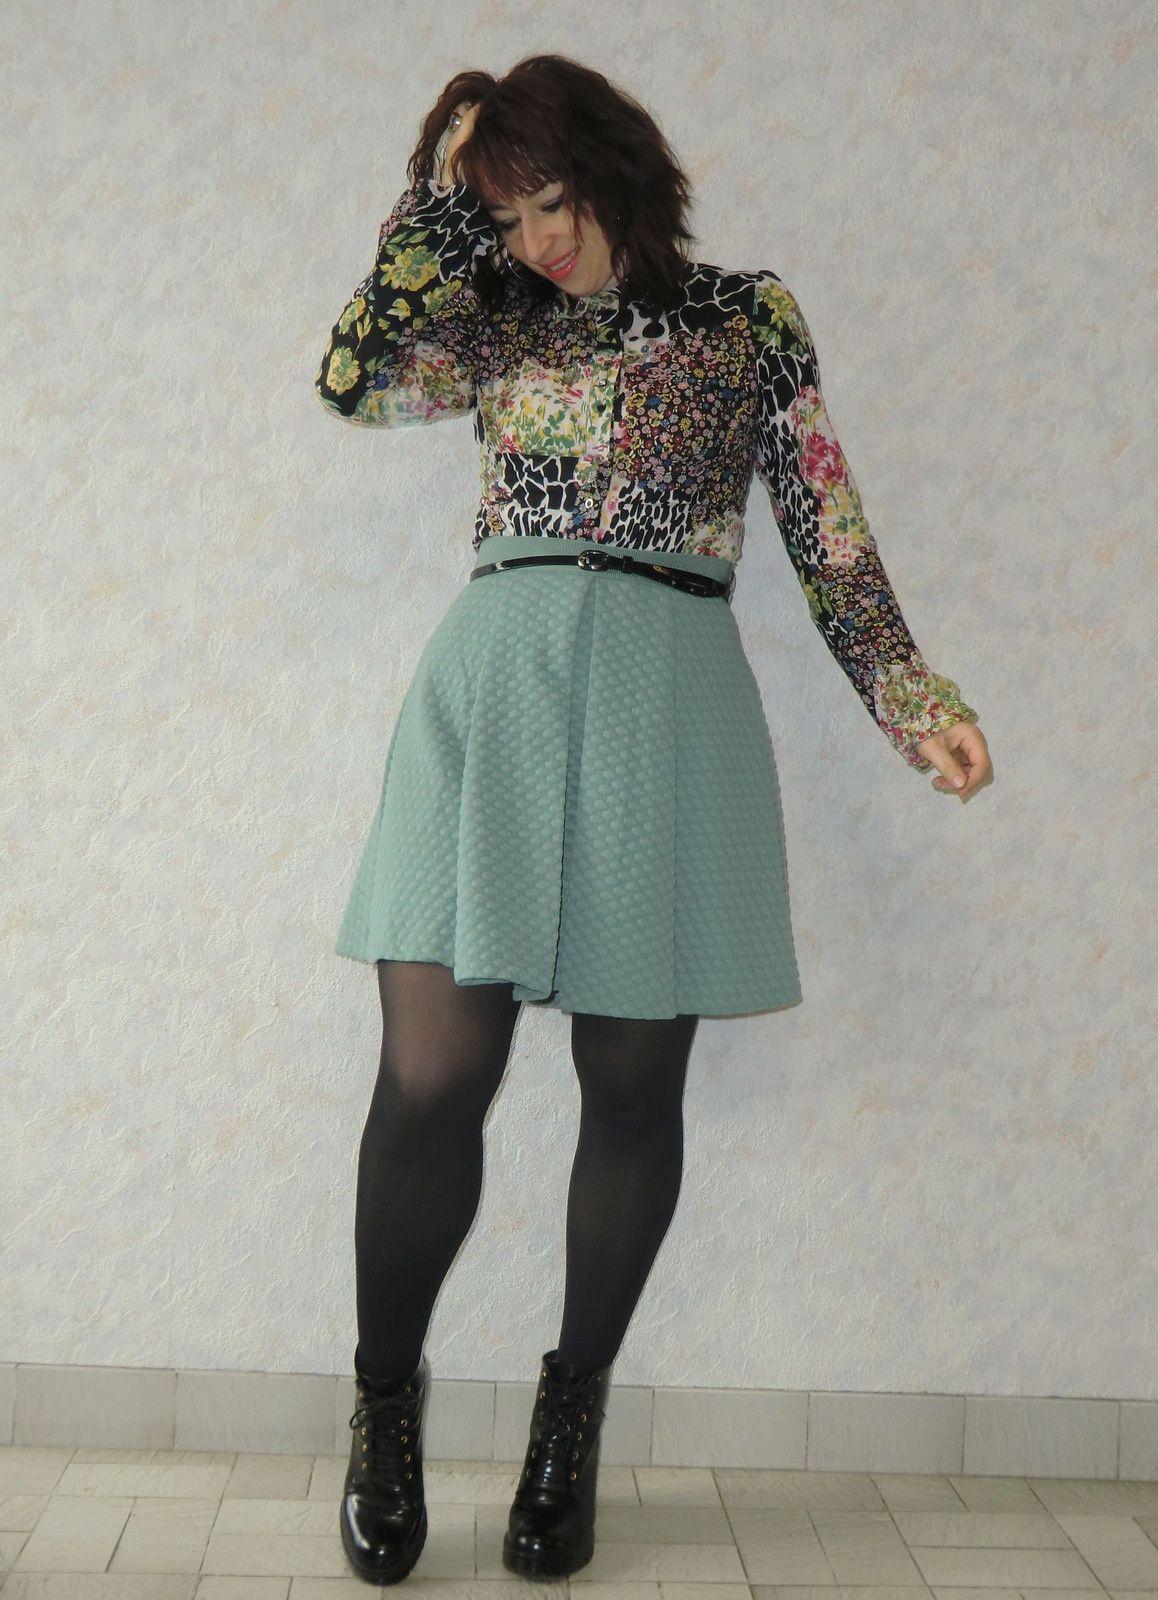 Minty skirt